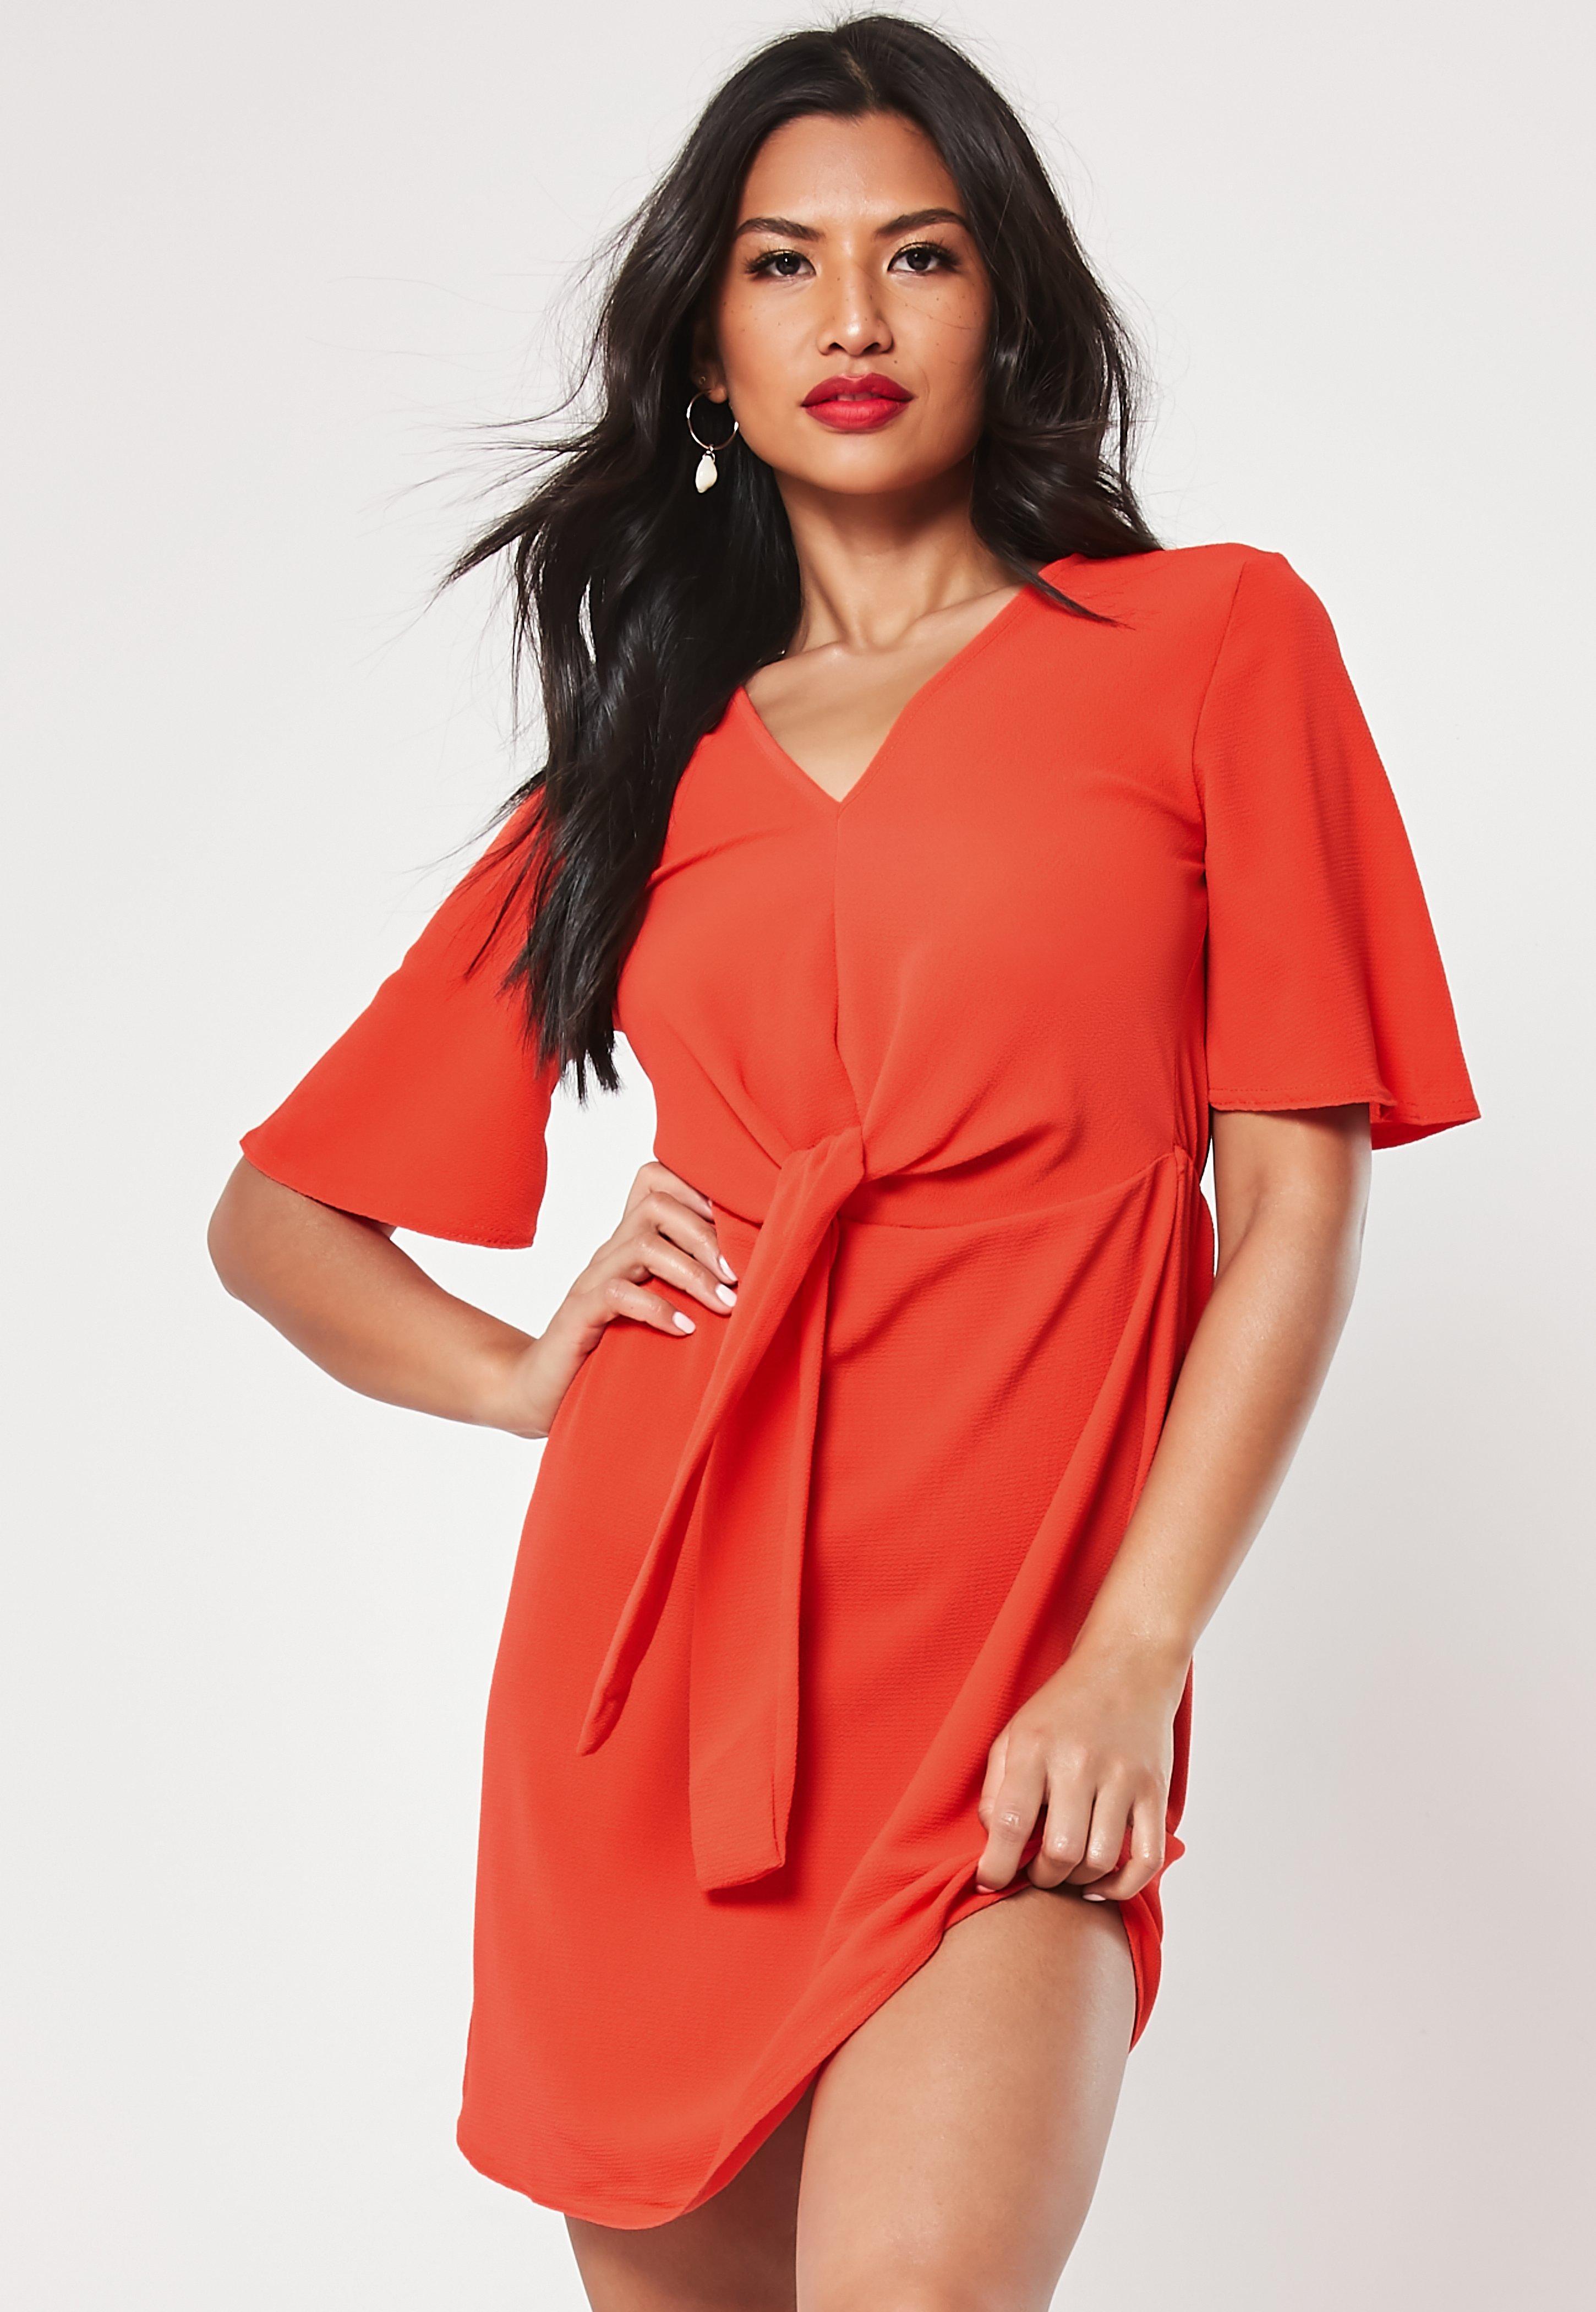 a291de74a4 Red Dresses